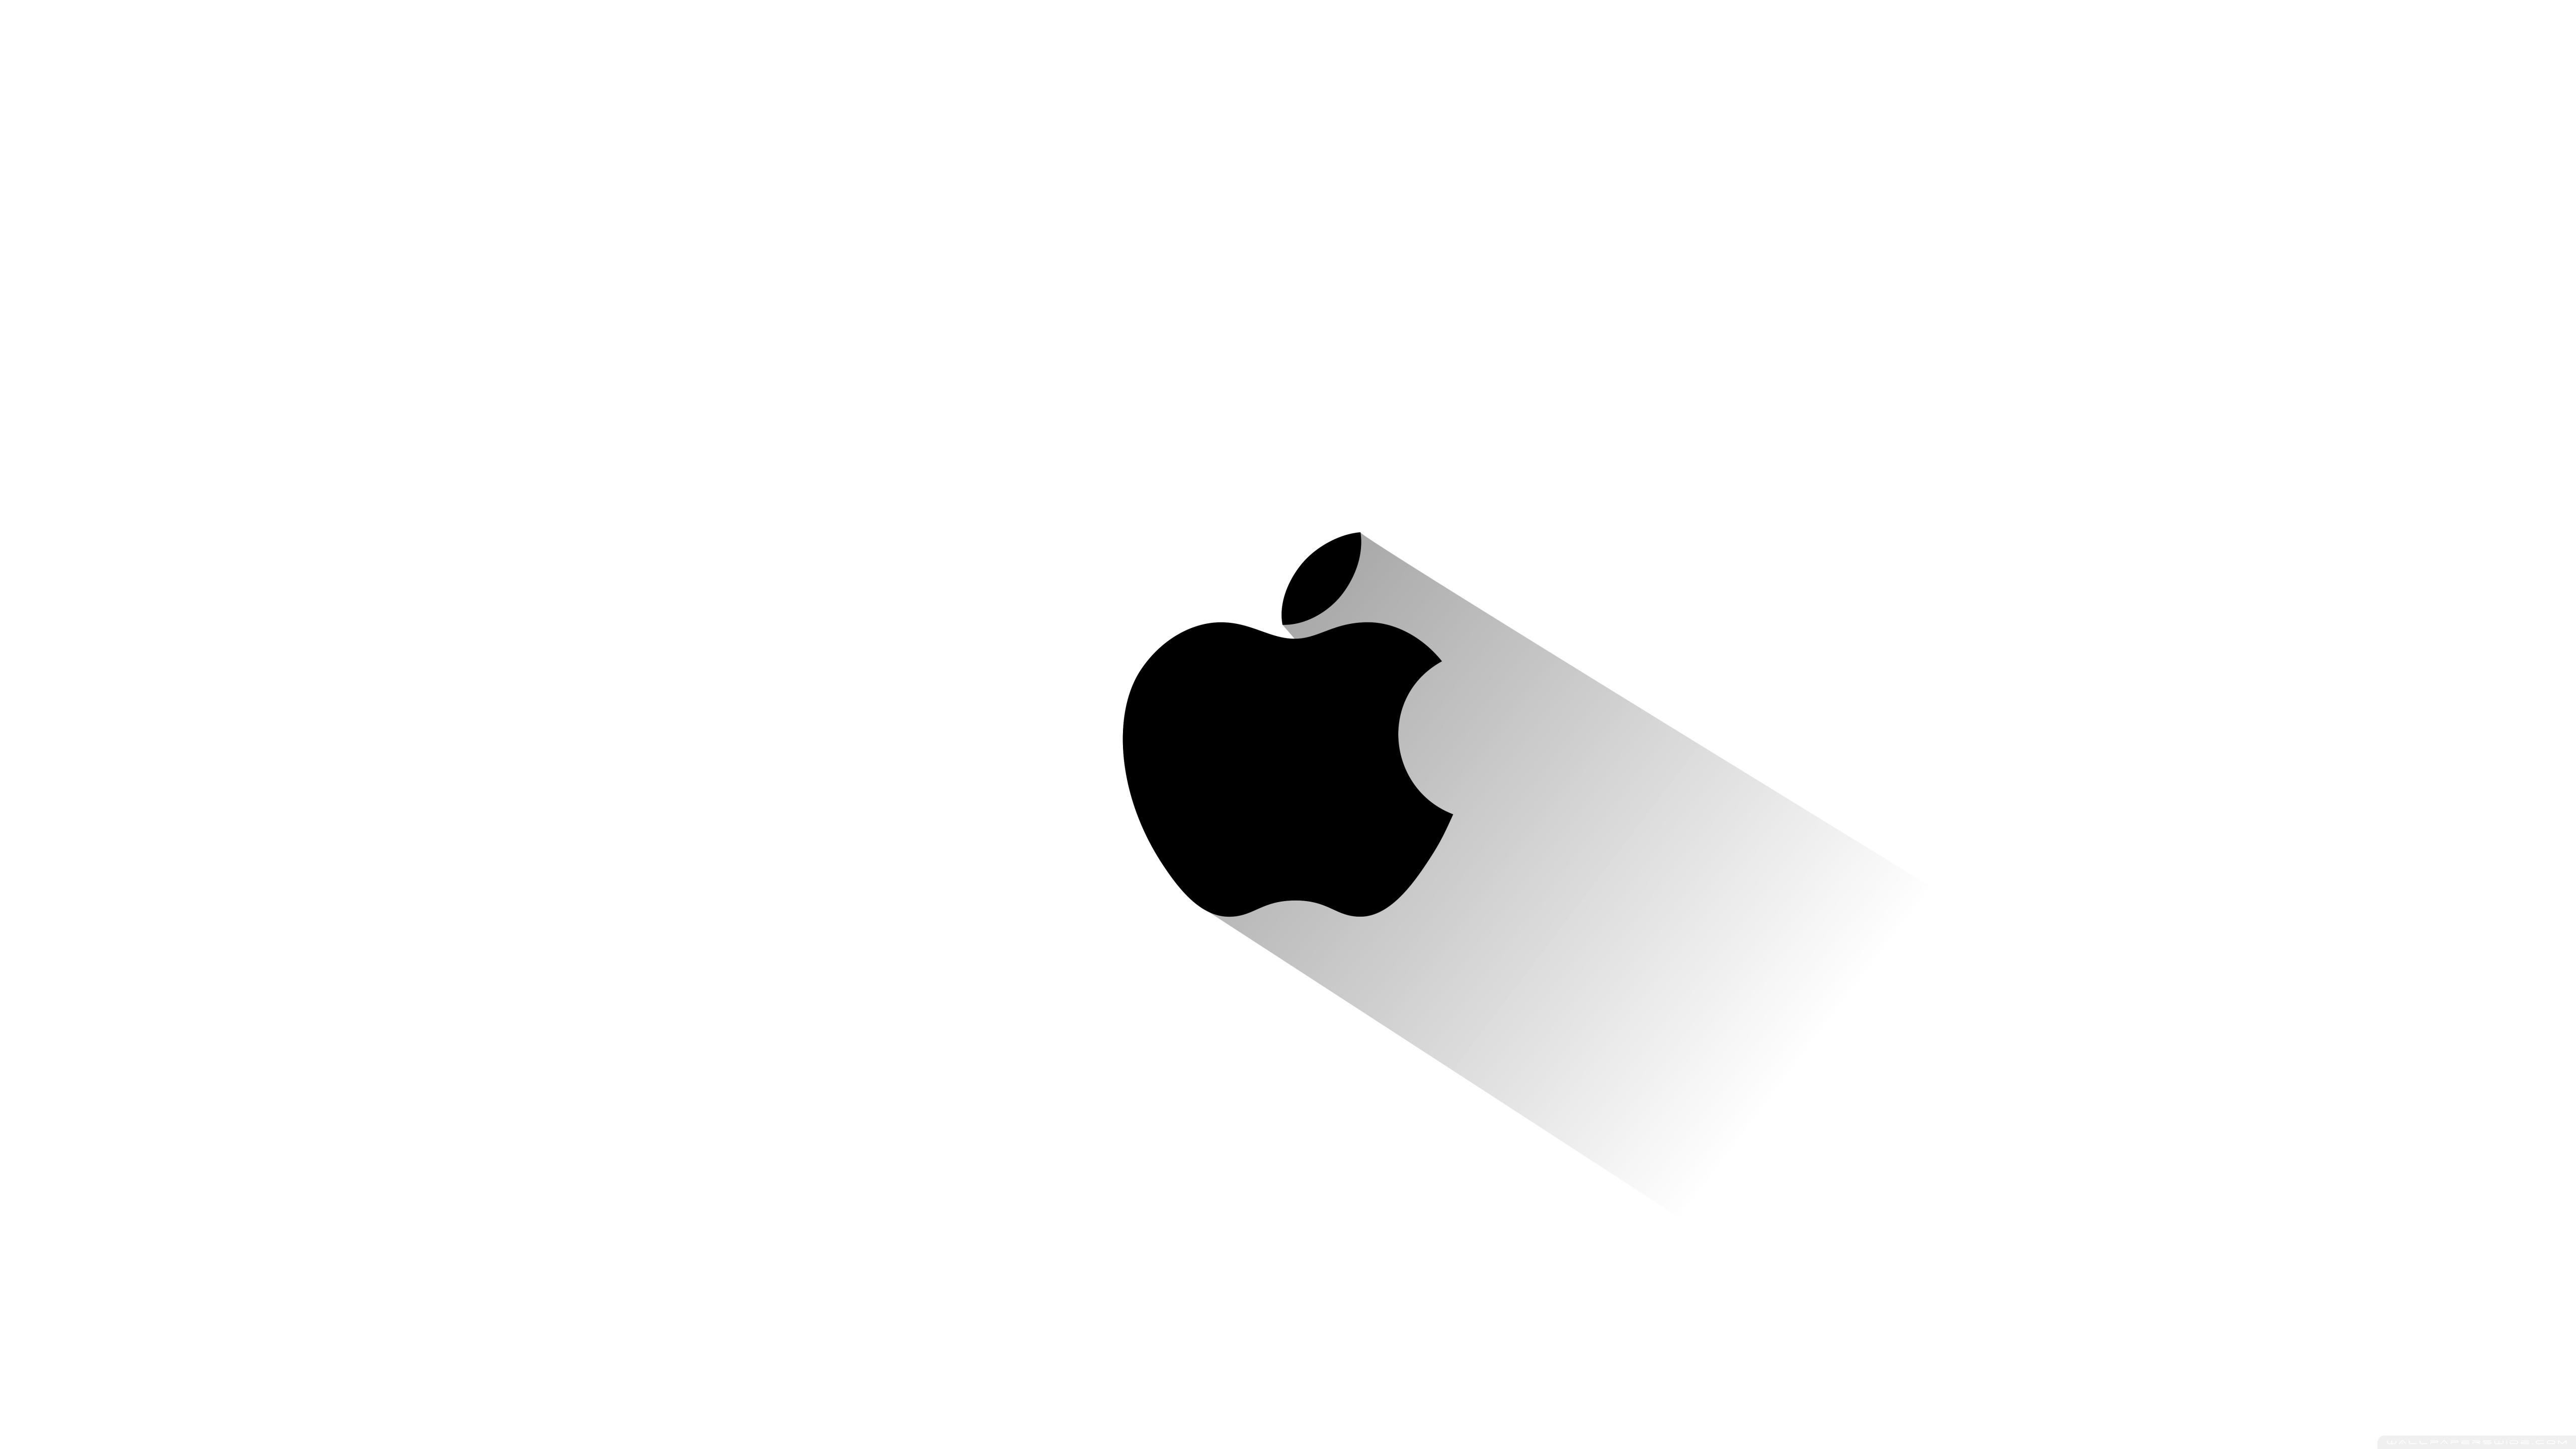 Apple Logo Drawing